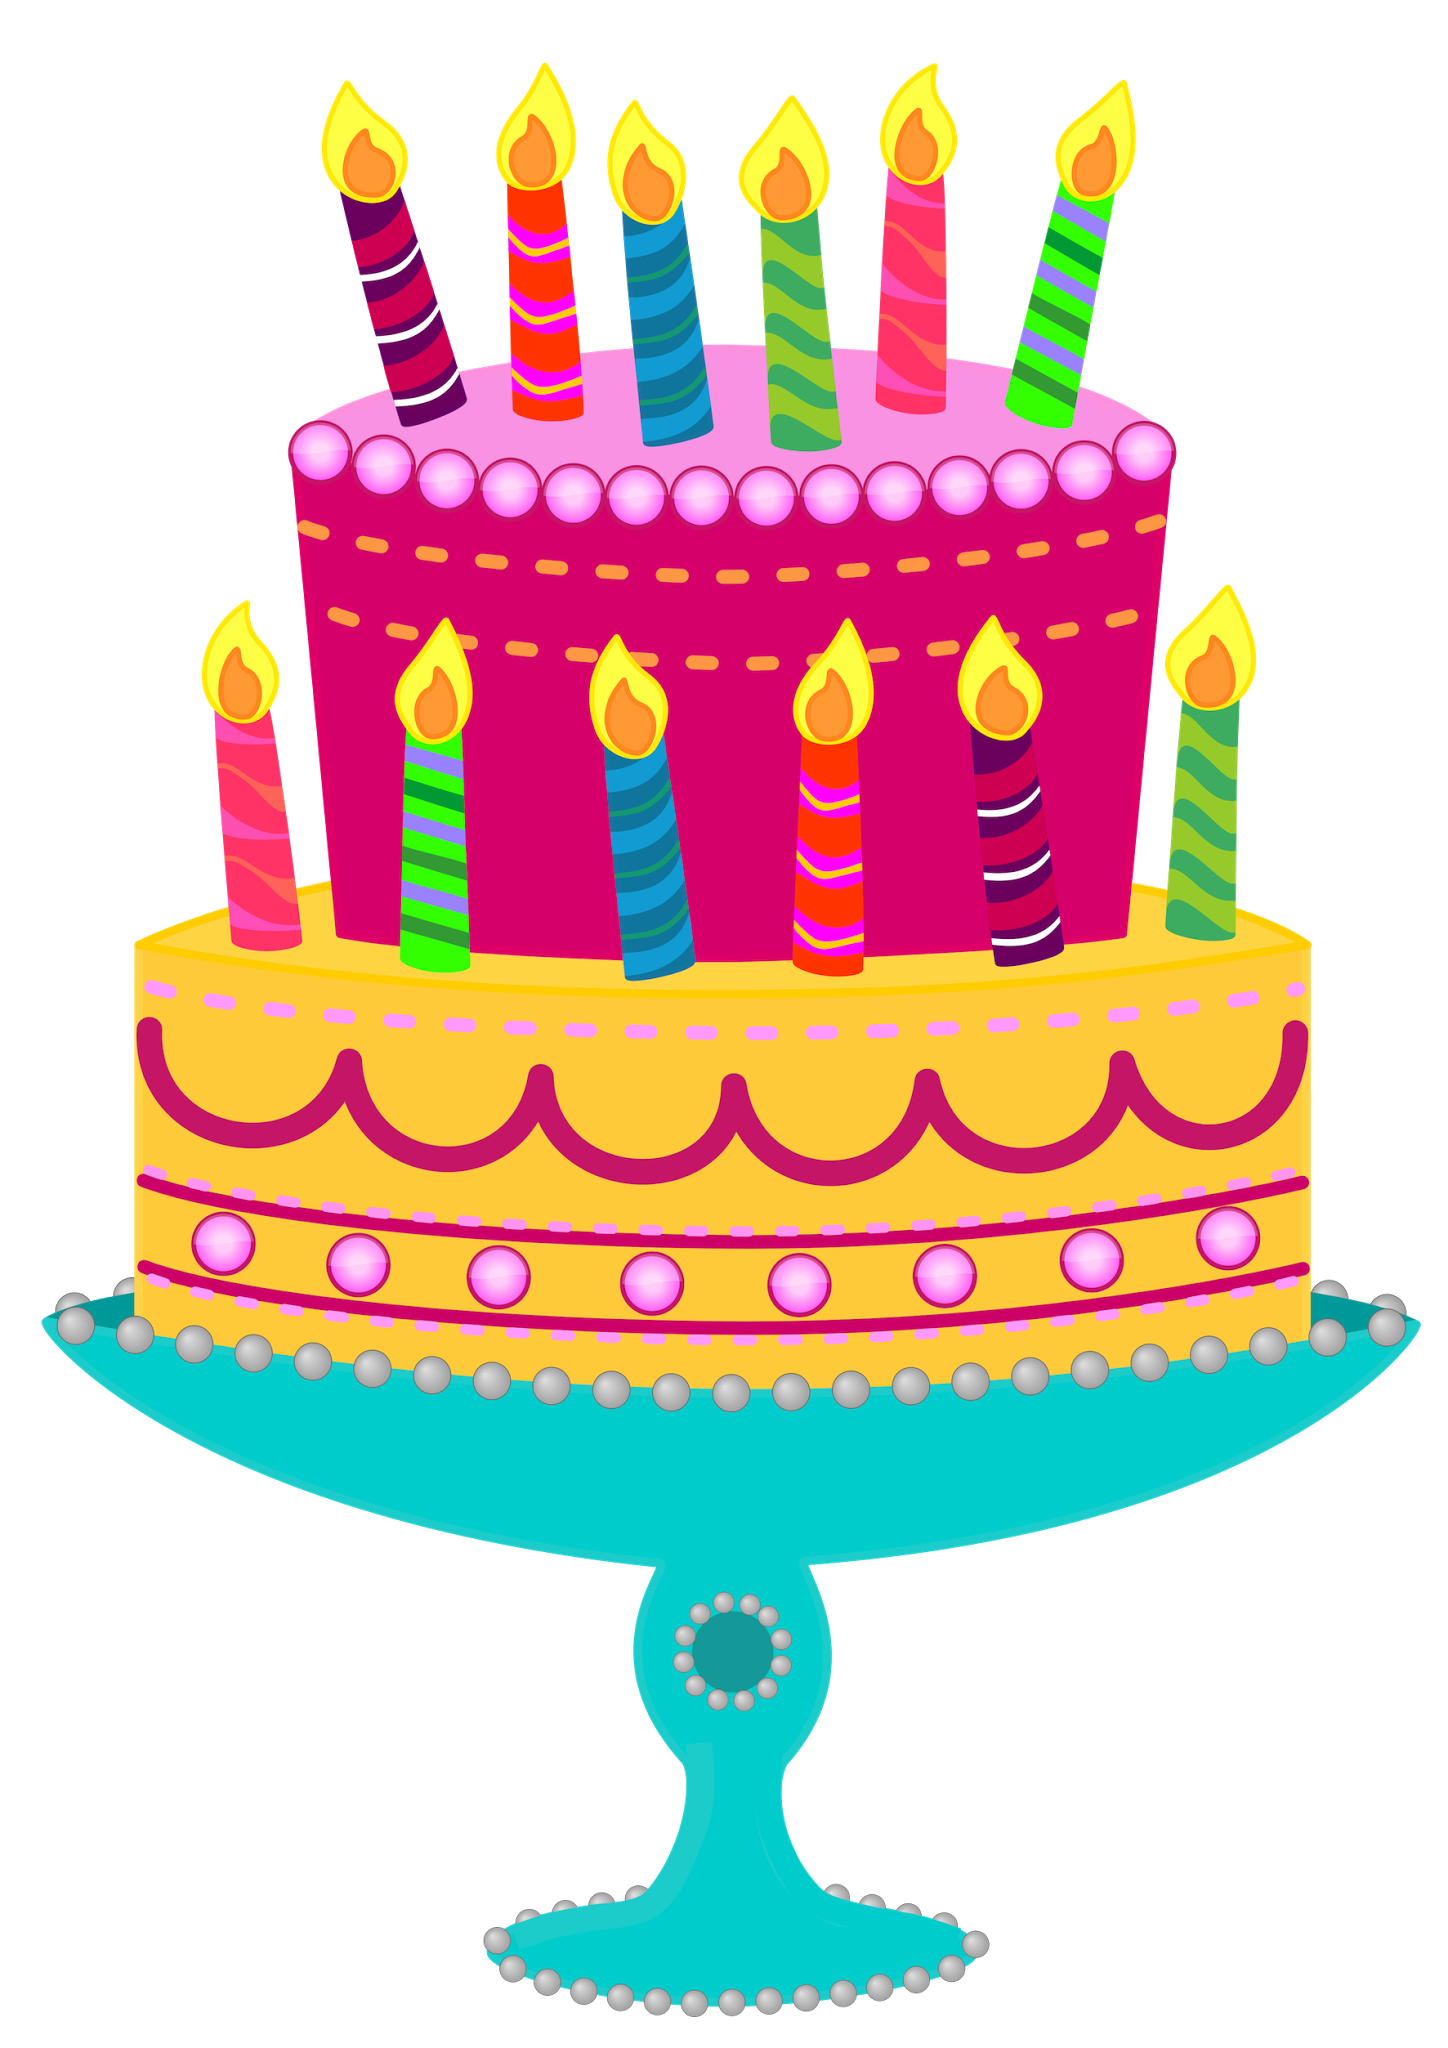 Simple clipart birthday cake #10